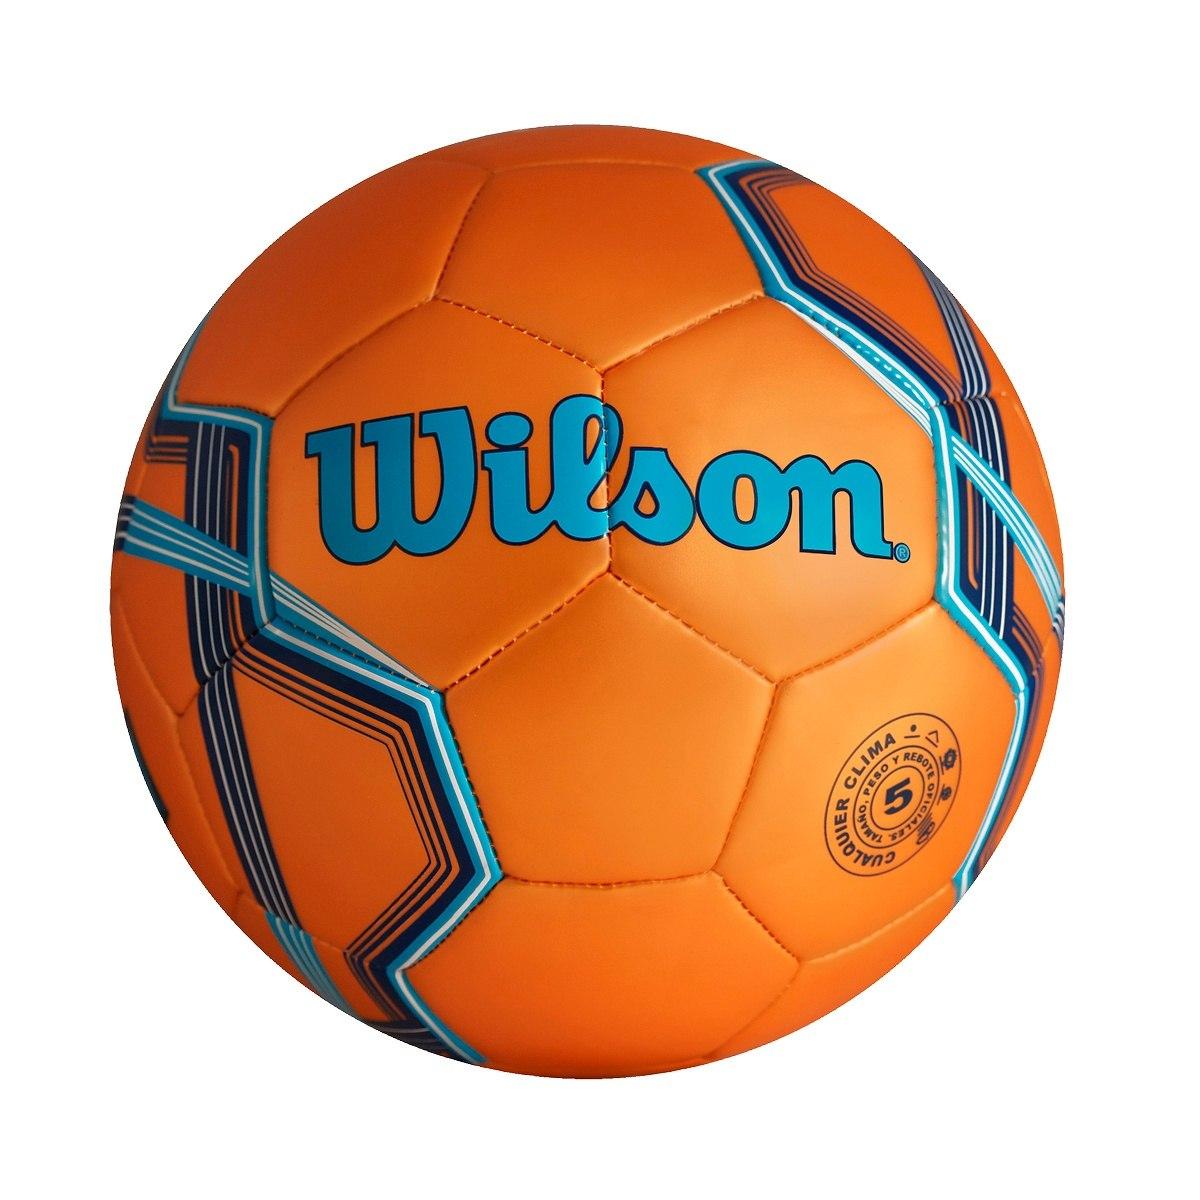 2032ad17bab26 Balon Futbol Soccer Wilson Silver Naranja No. 5 -   260.00 en ...